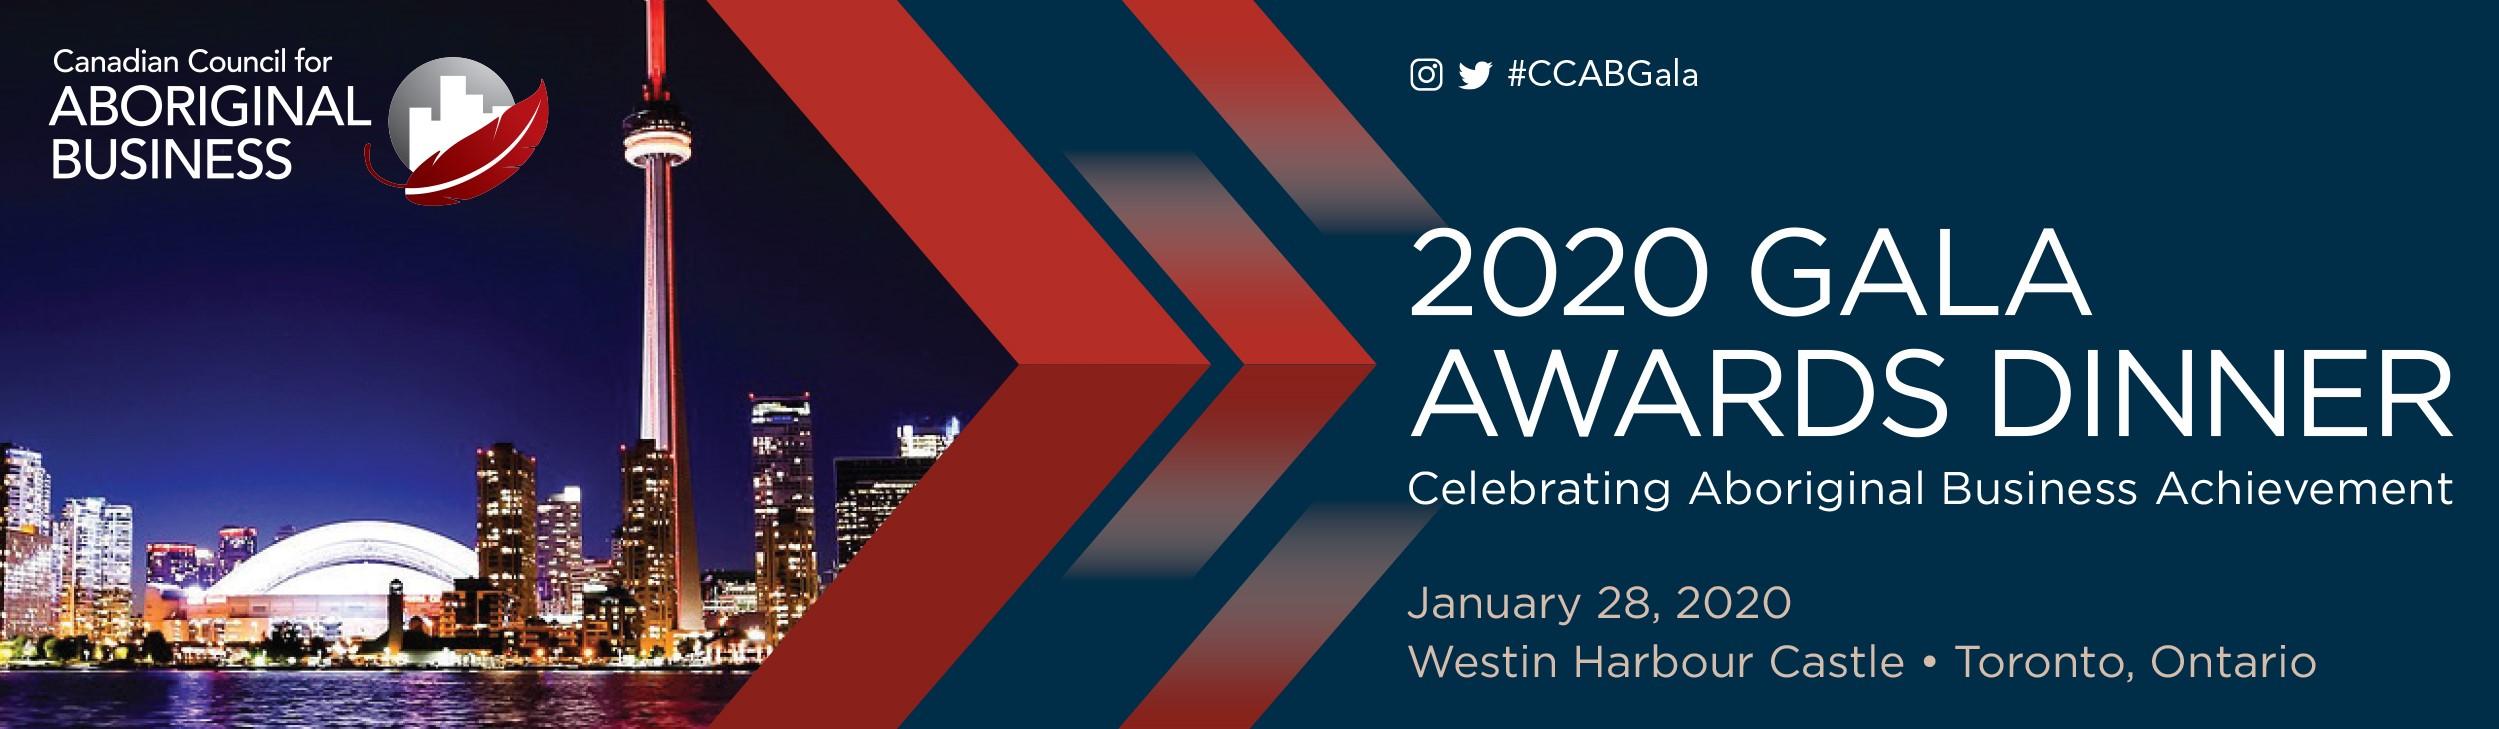 2020-Gala-Awards-Dinner-high-res-banner